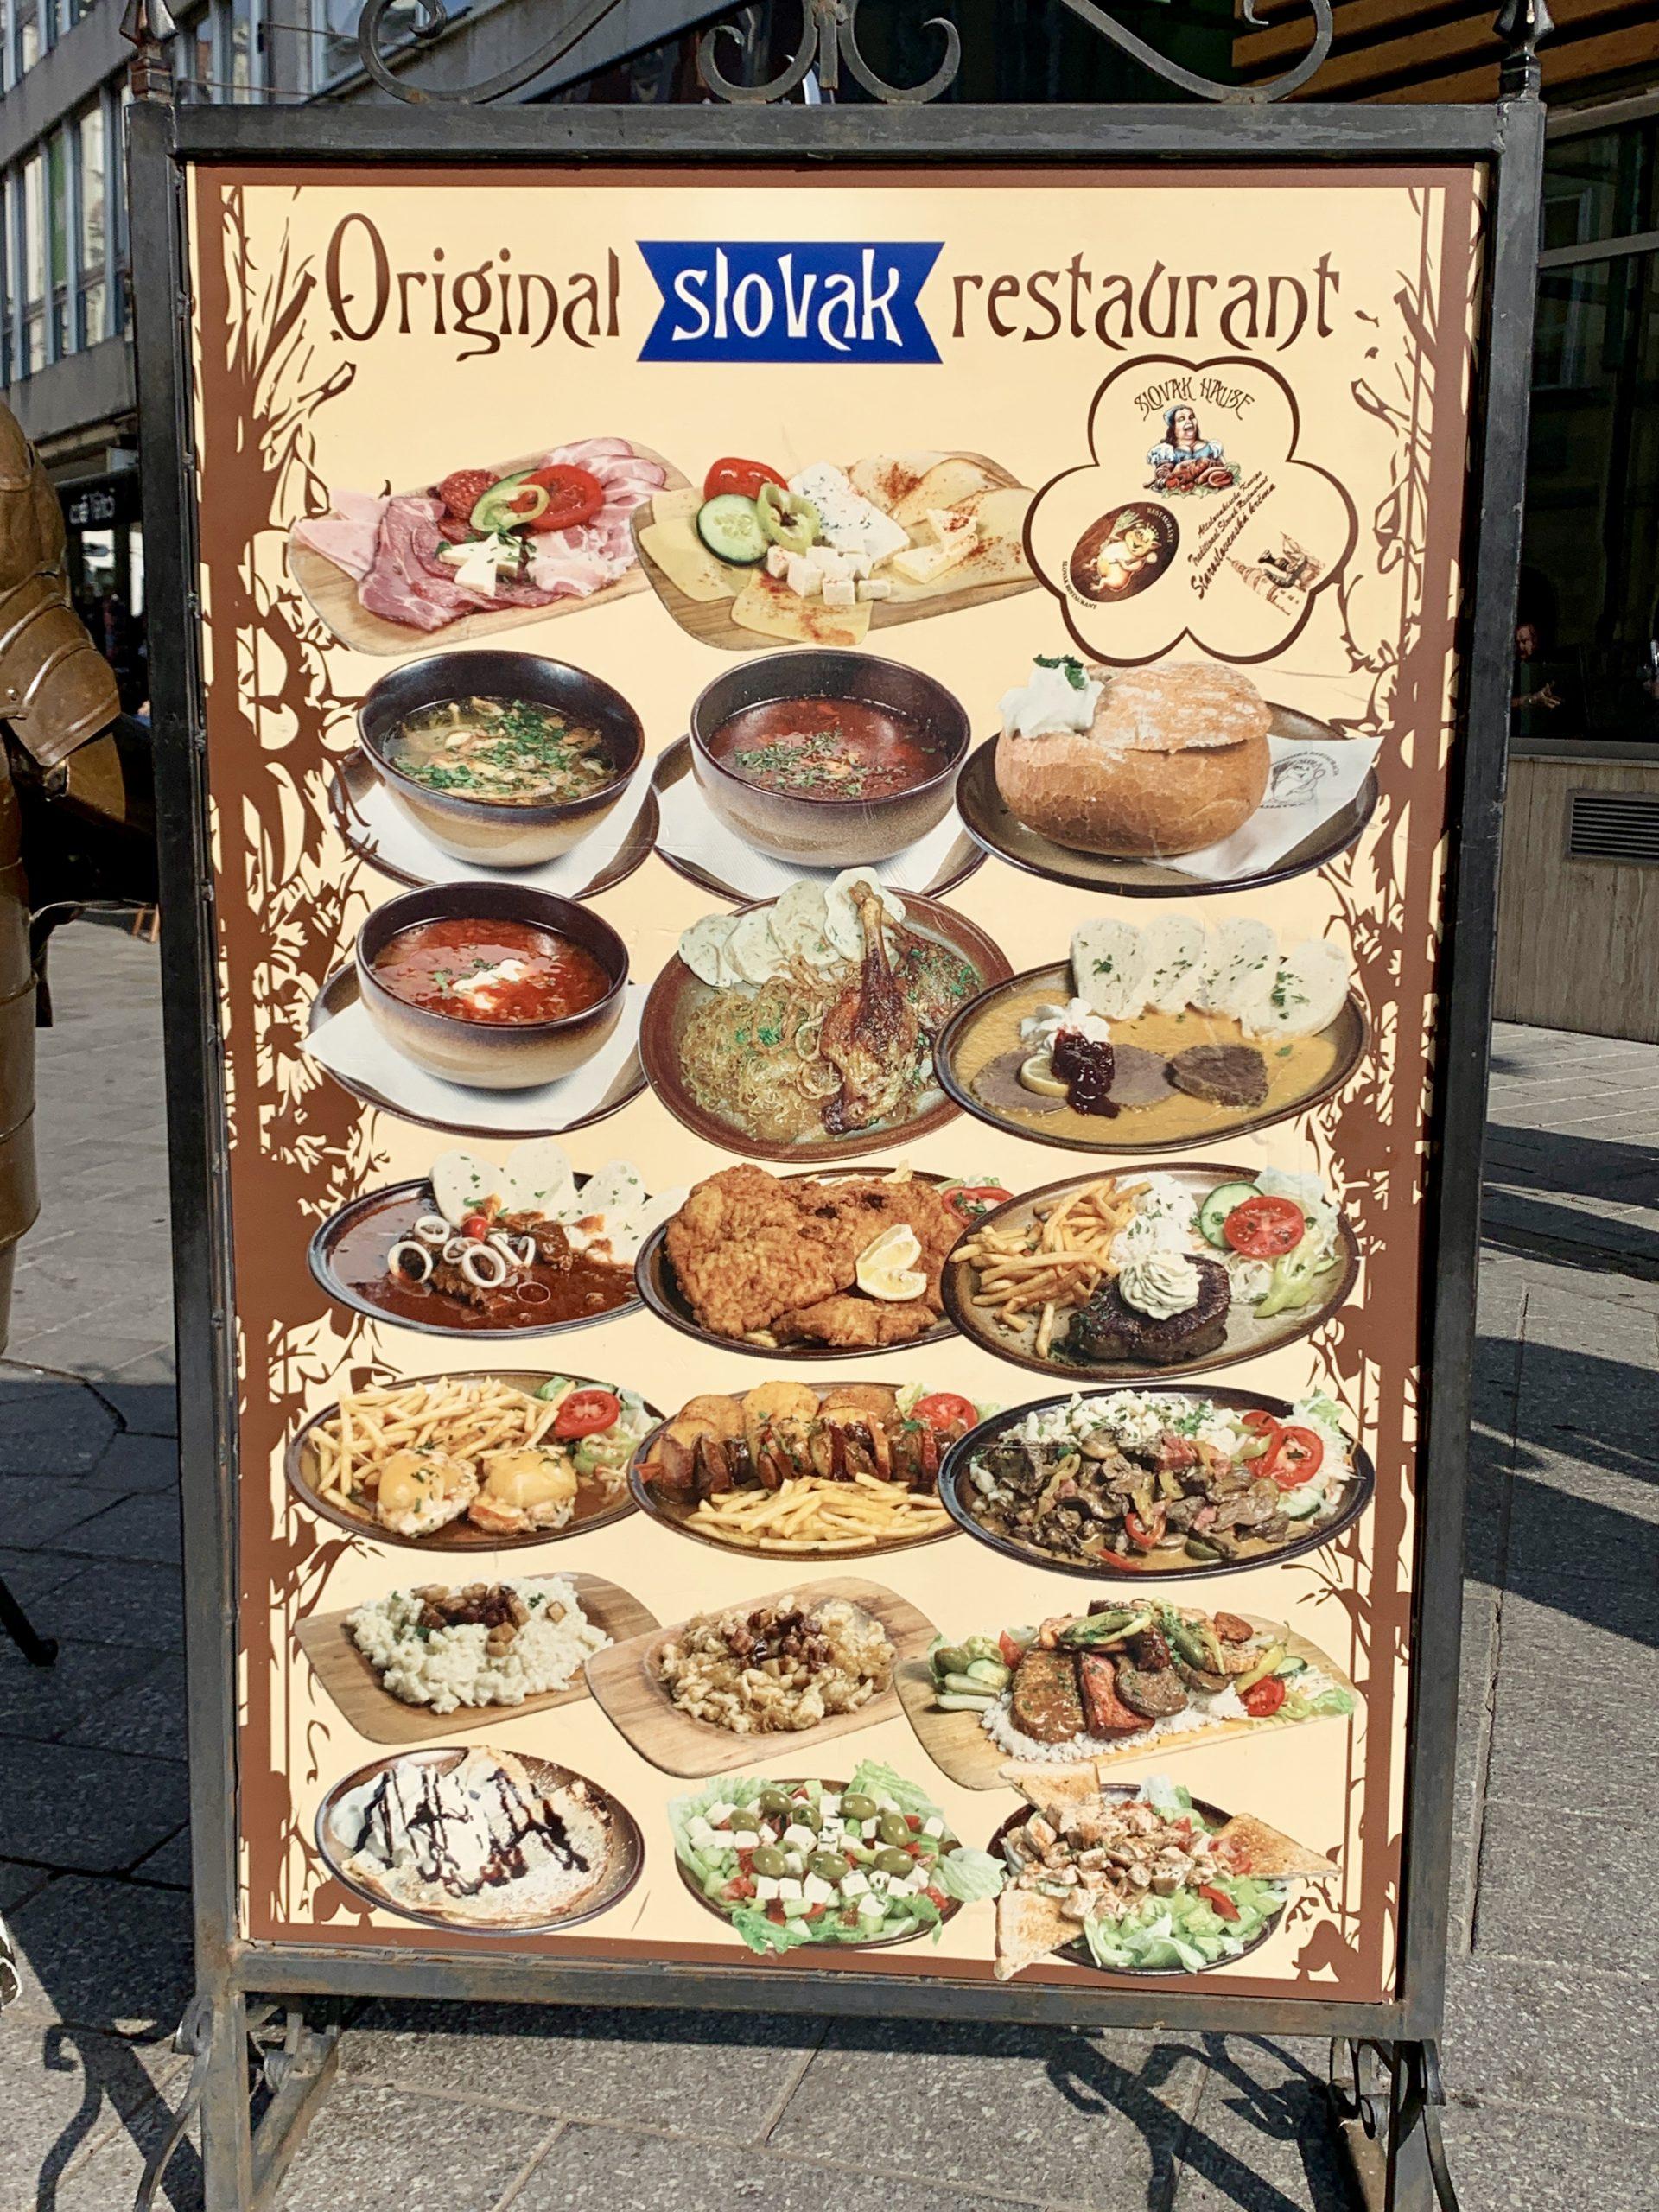 slovakian cuisine board